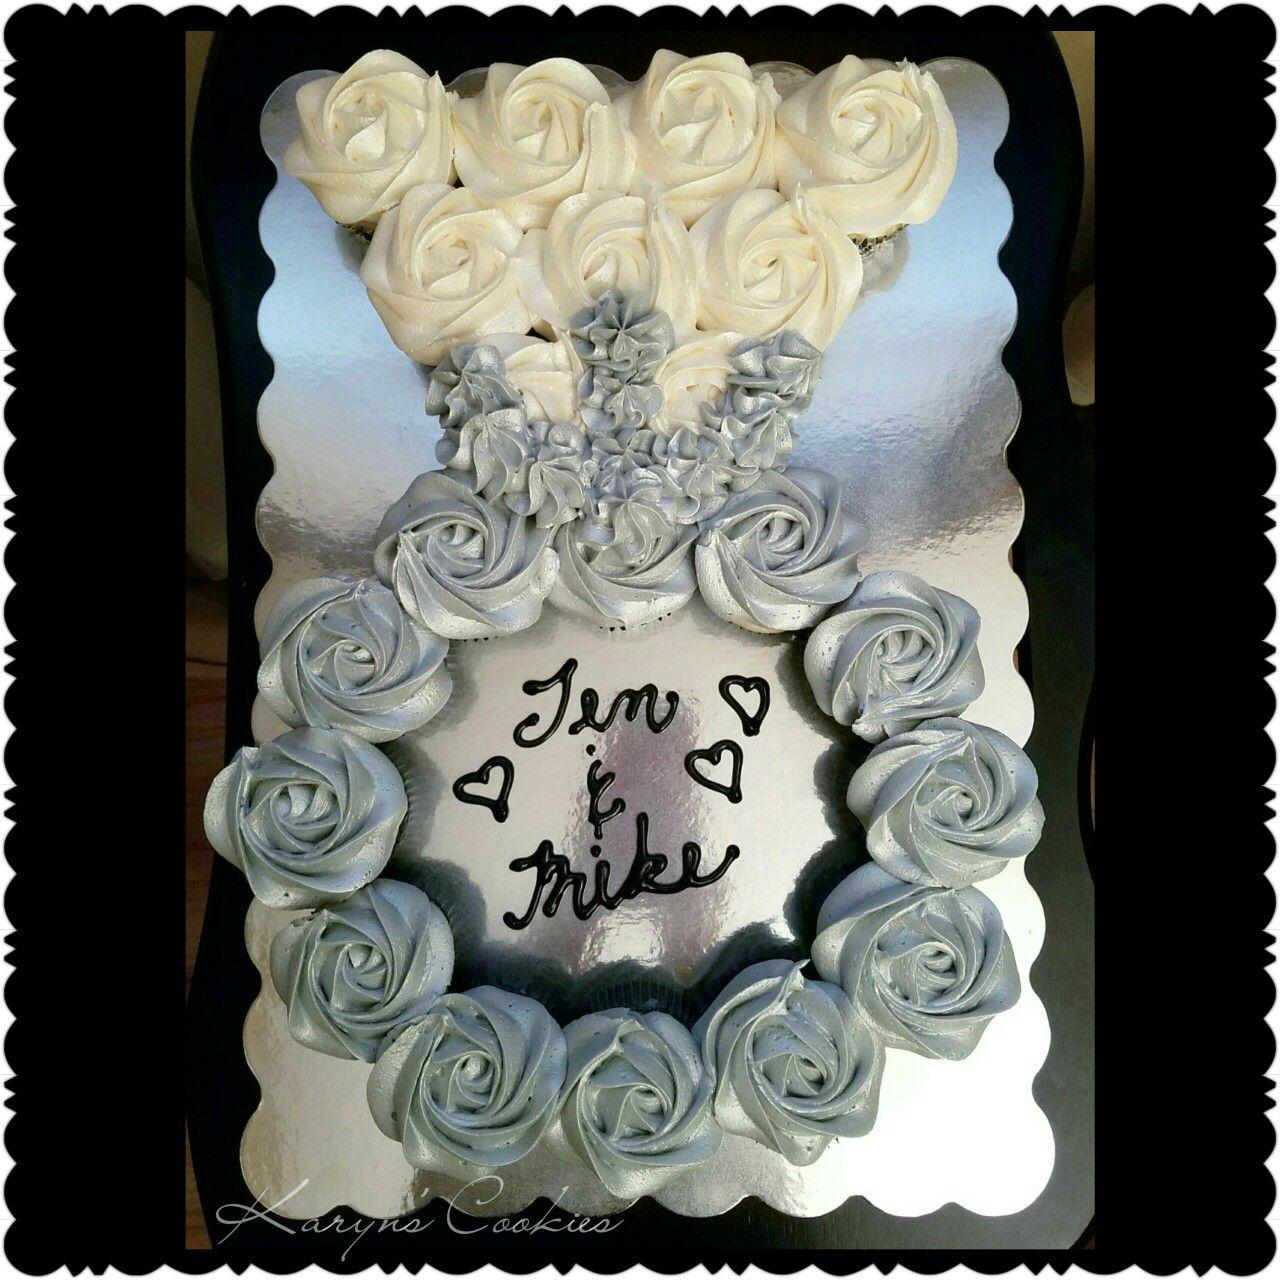 12 Edible hen party Cup Cake Decoration Wedding bridal shower cupcake bridesmaid